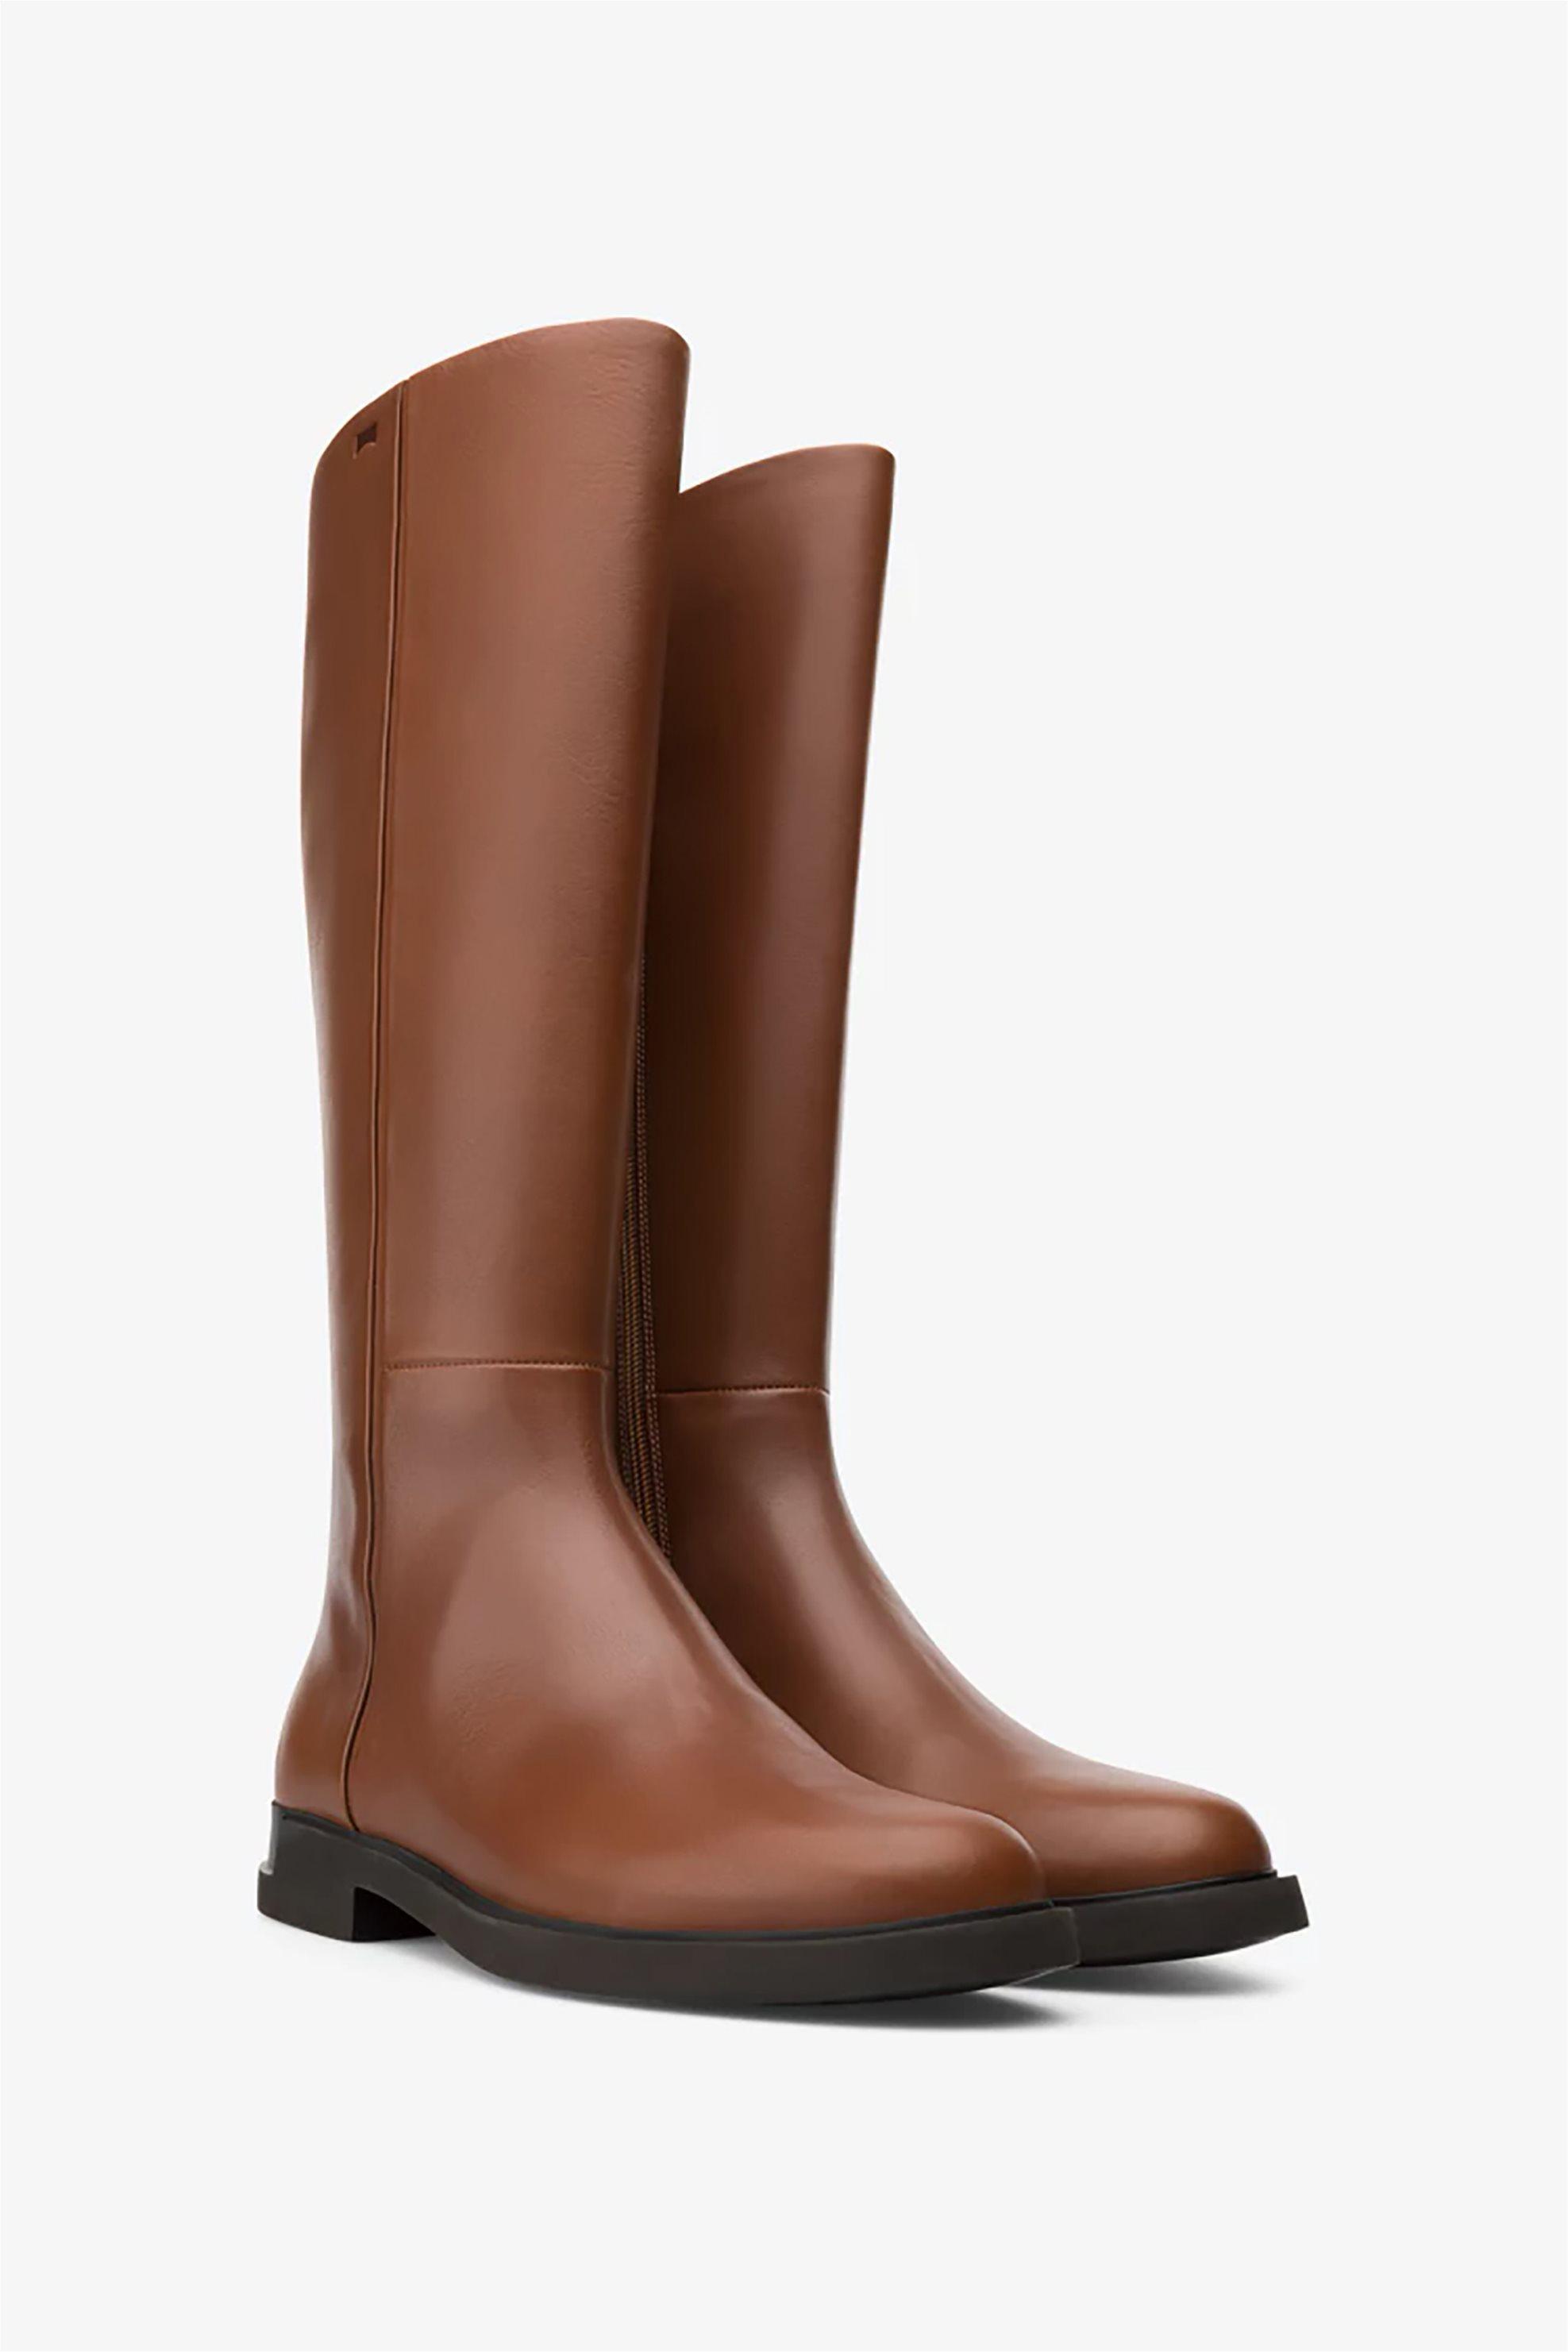 Camper γυναικείες δερμάτινες μπότες ως το γόνατο «Iman» – K400302-006 – Ταμπά